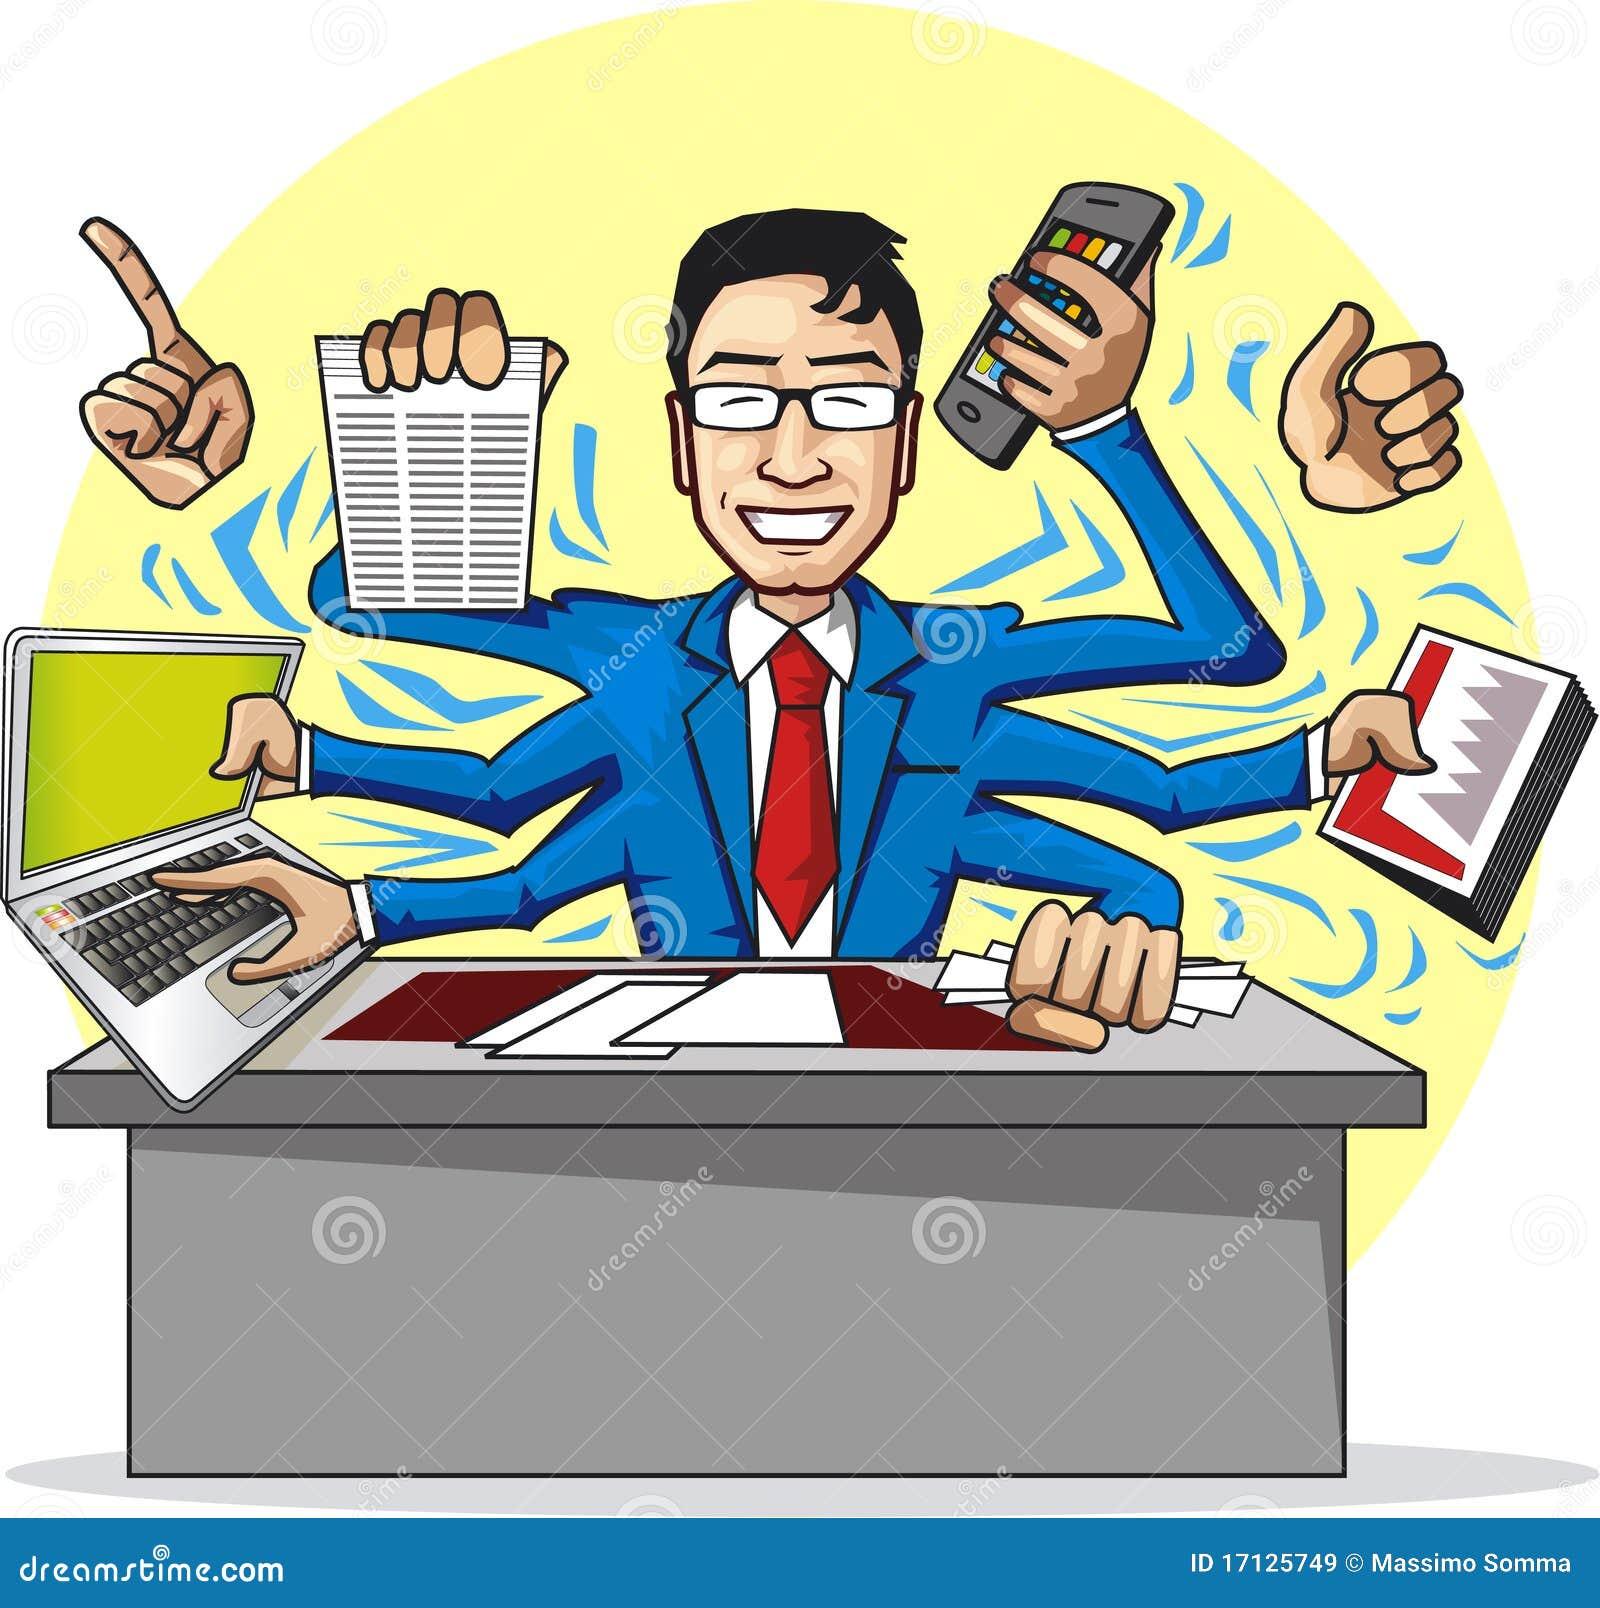 Busy Office Clip Art   www.pixshark.com - Images Galleries ...